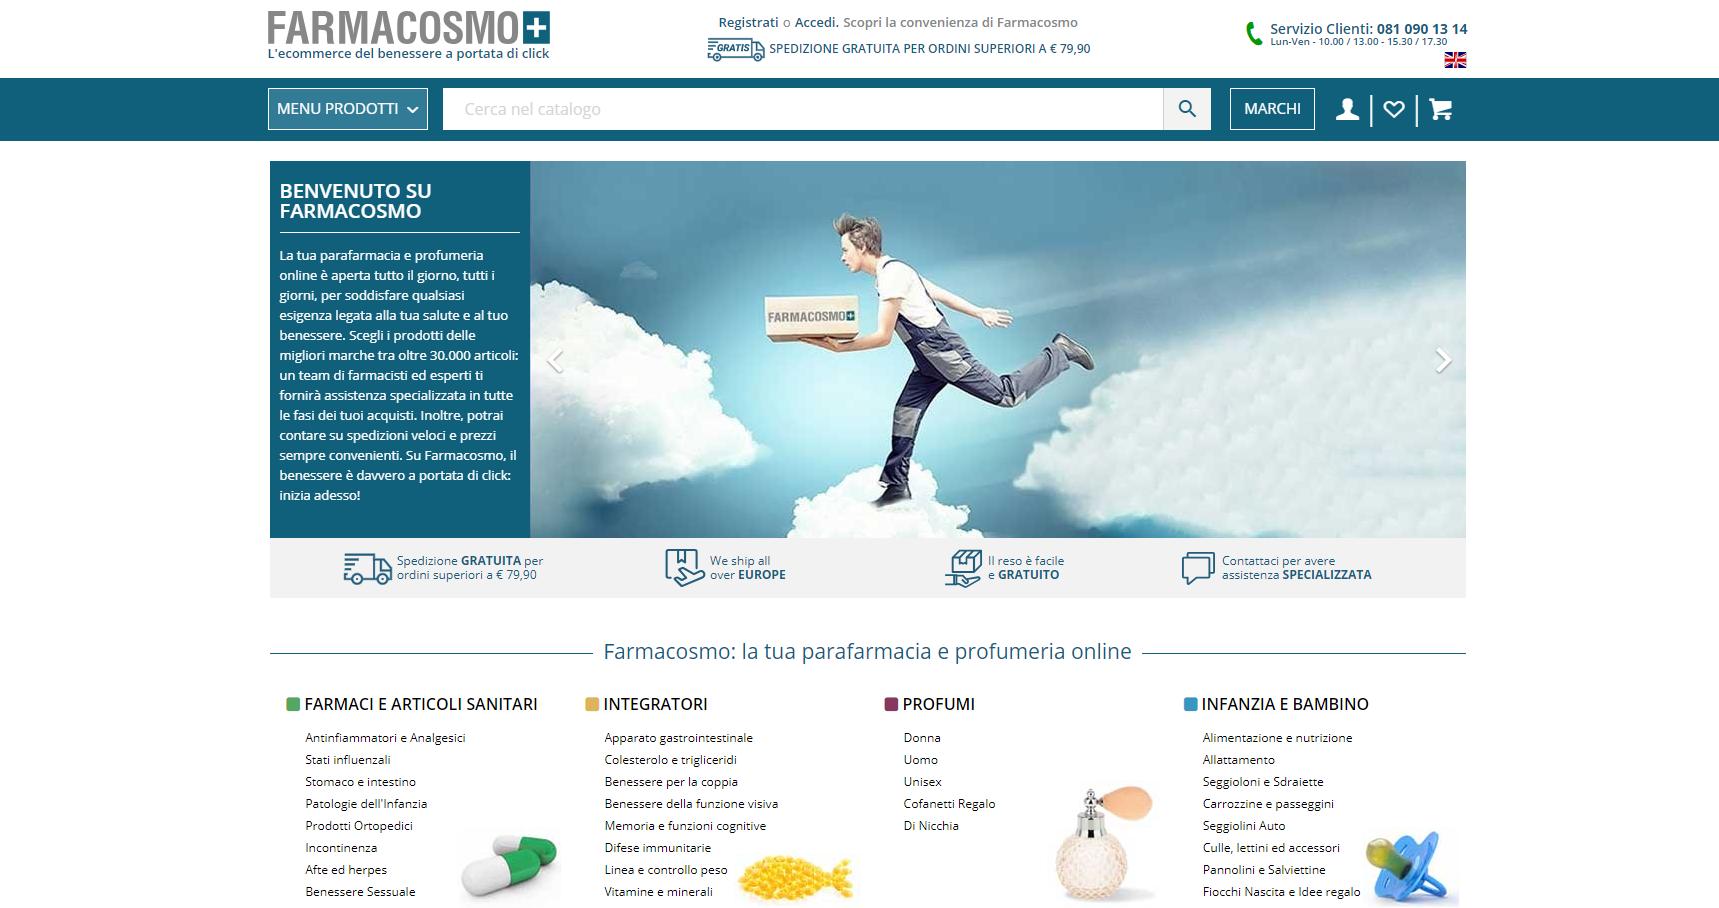 Farmacosmo parafarmacia online